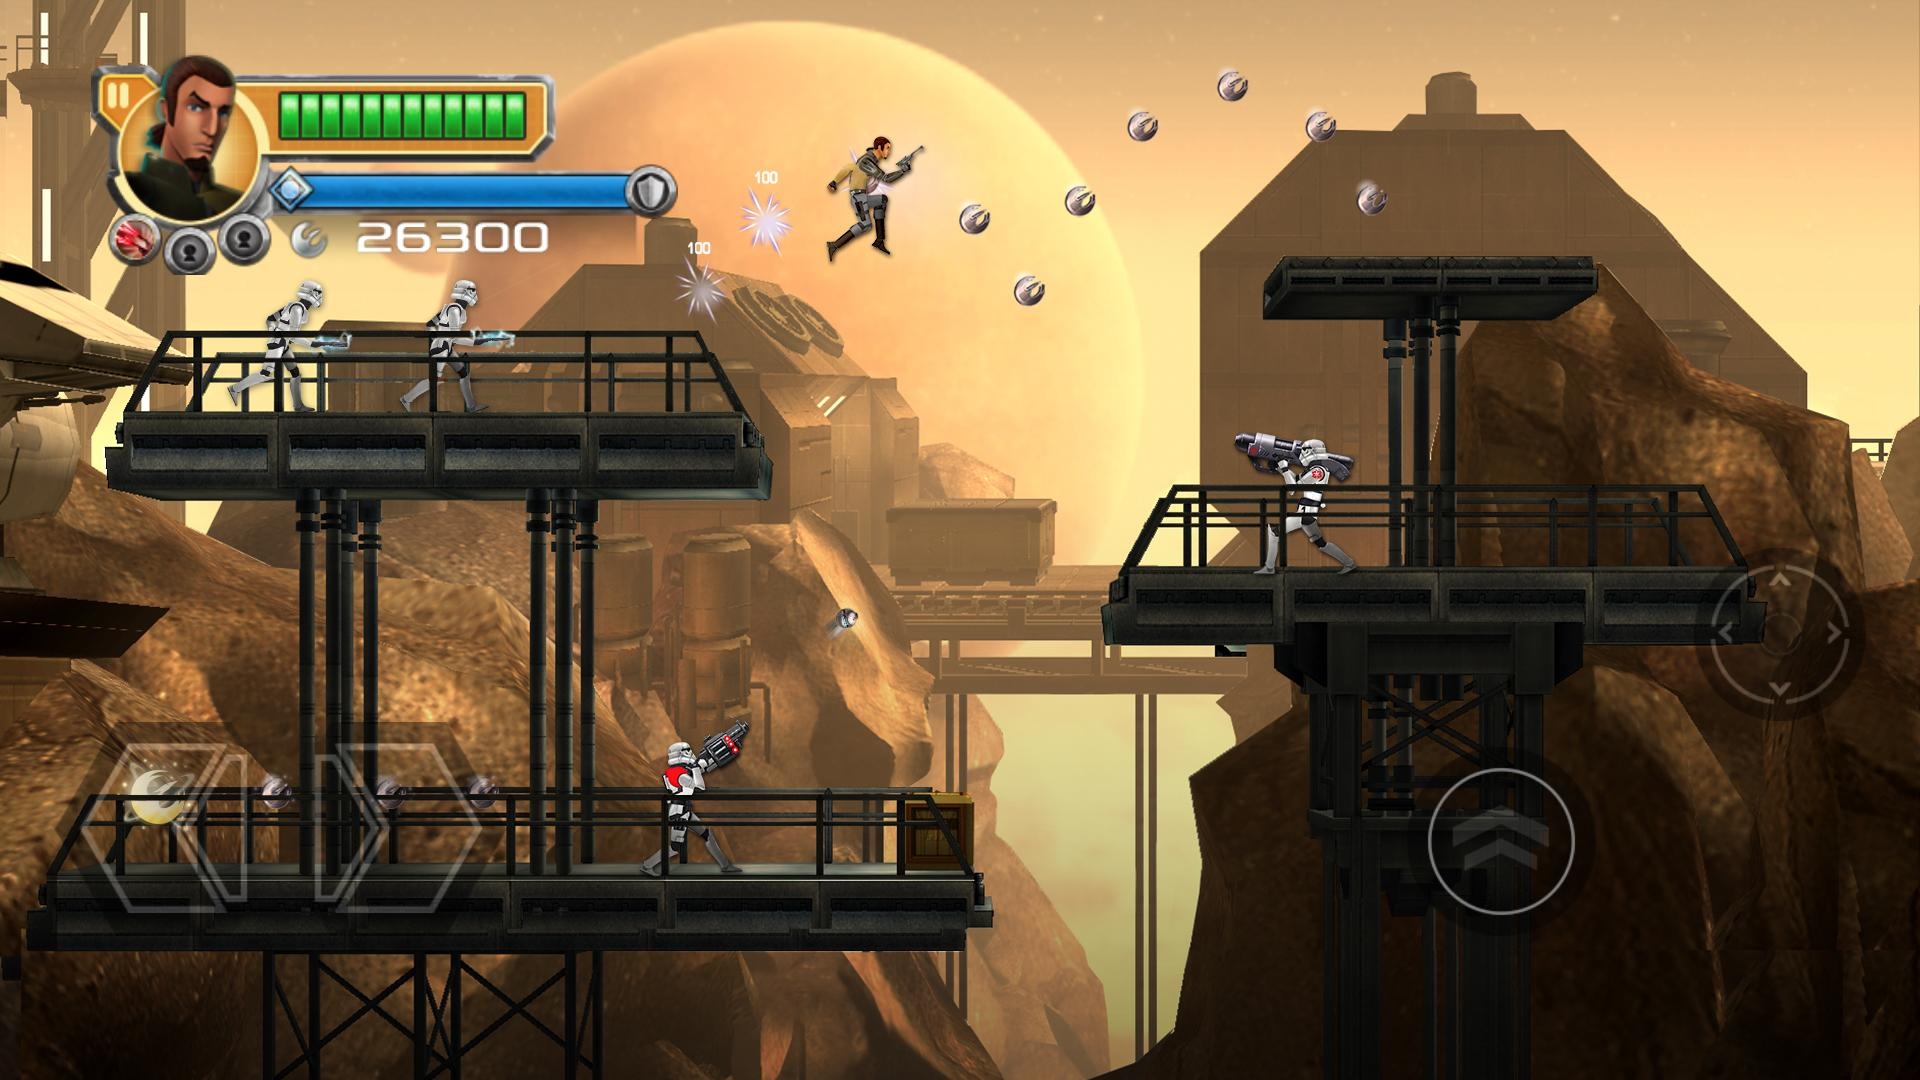 Star Wars Rebels: Missions screenshot #20